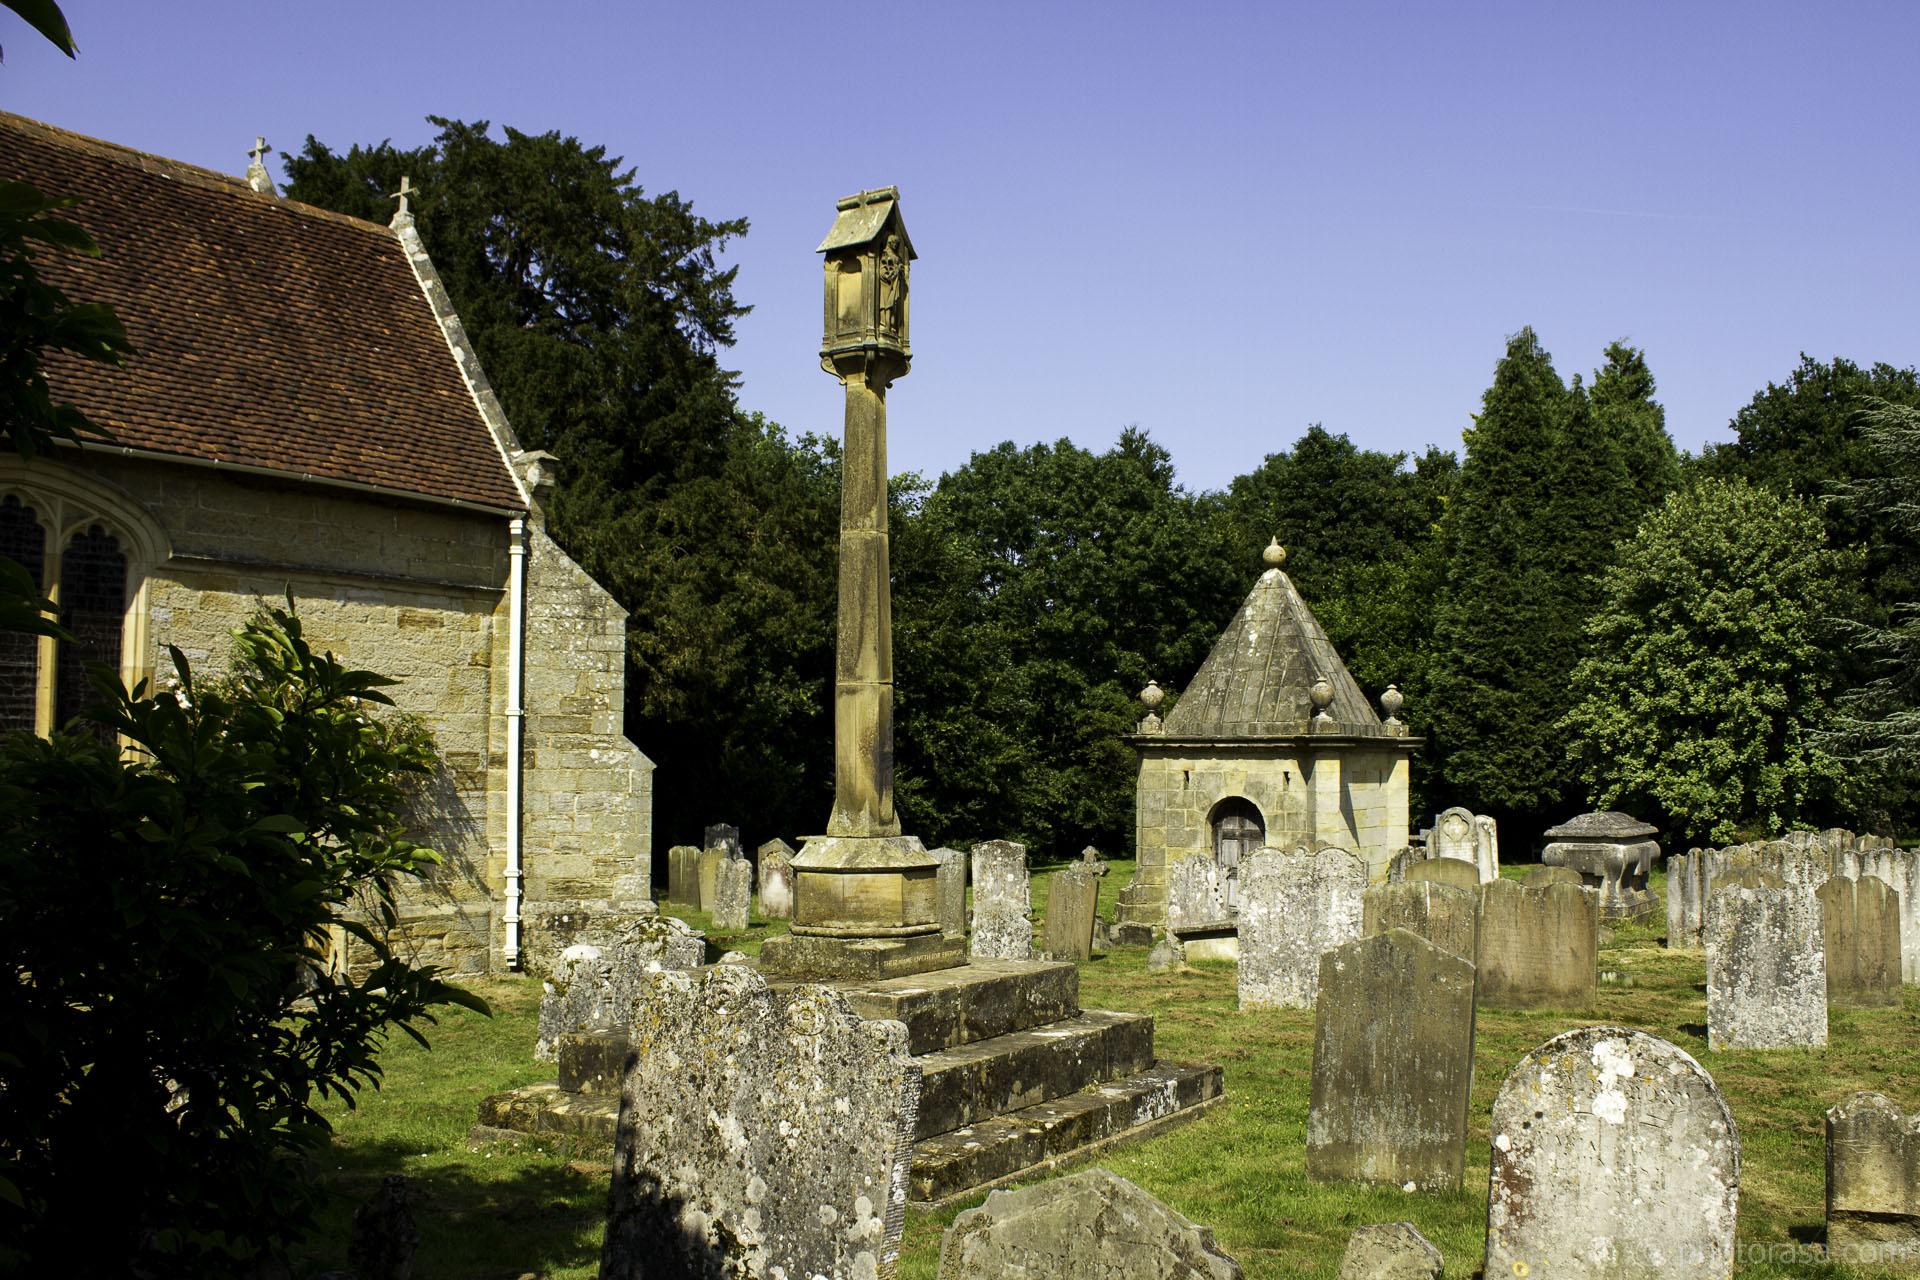 https://photorasa.com/st-marys-church-in-chiddingstone/churchyard-at-saint-marys/